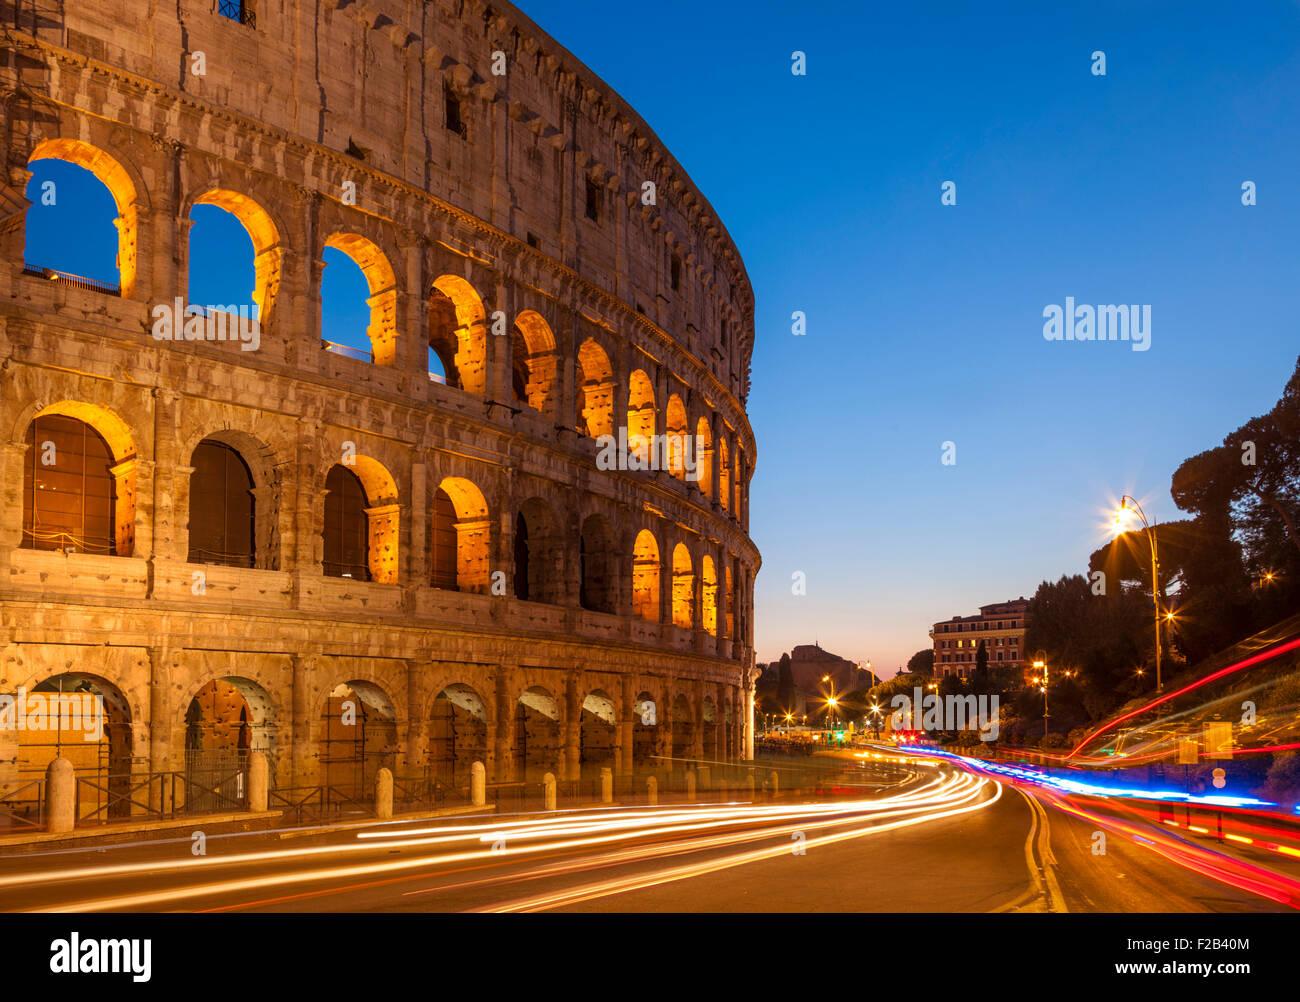 Kolosseum in Rom oder Flavian Amphitheater bei Nacht mit Licht Routen Rom Lazio Region Italien EU Europa Stockbild